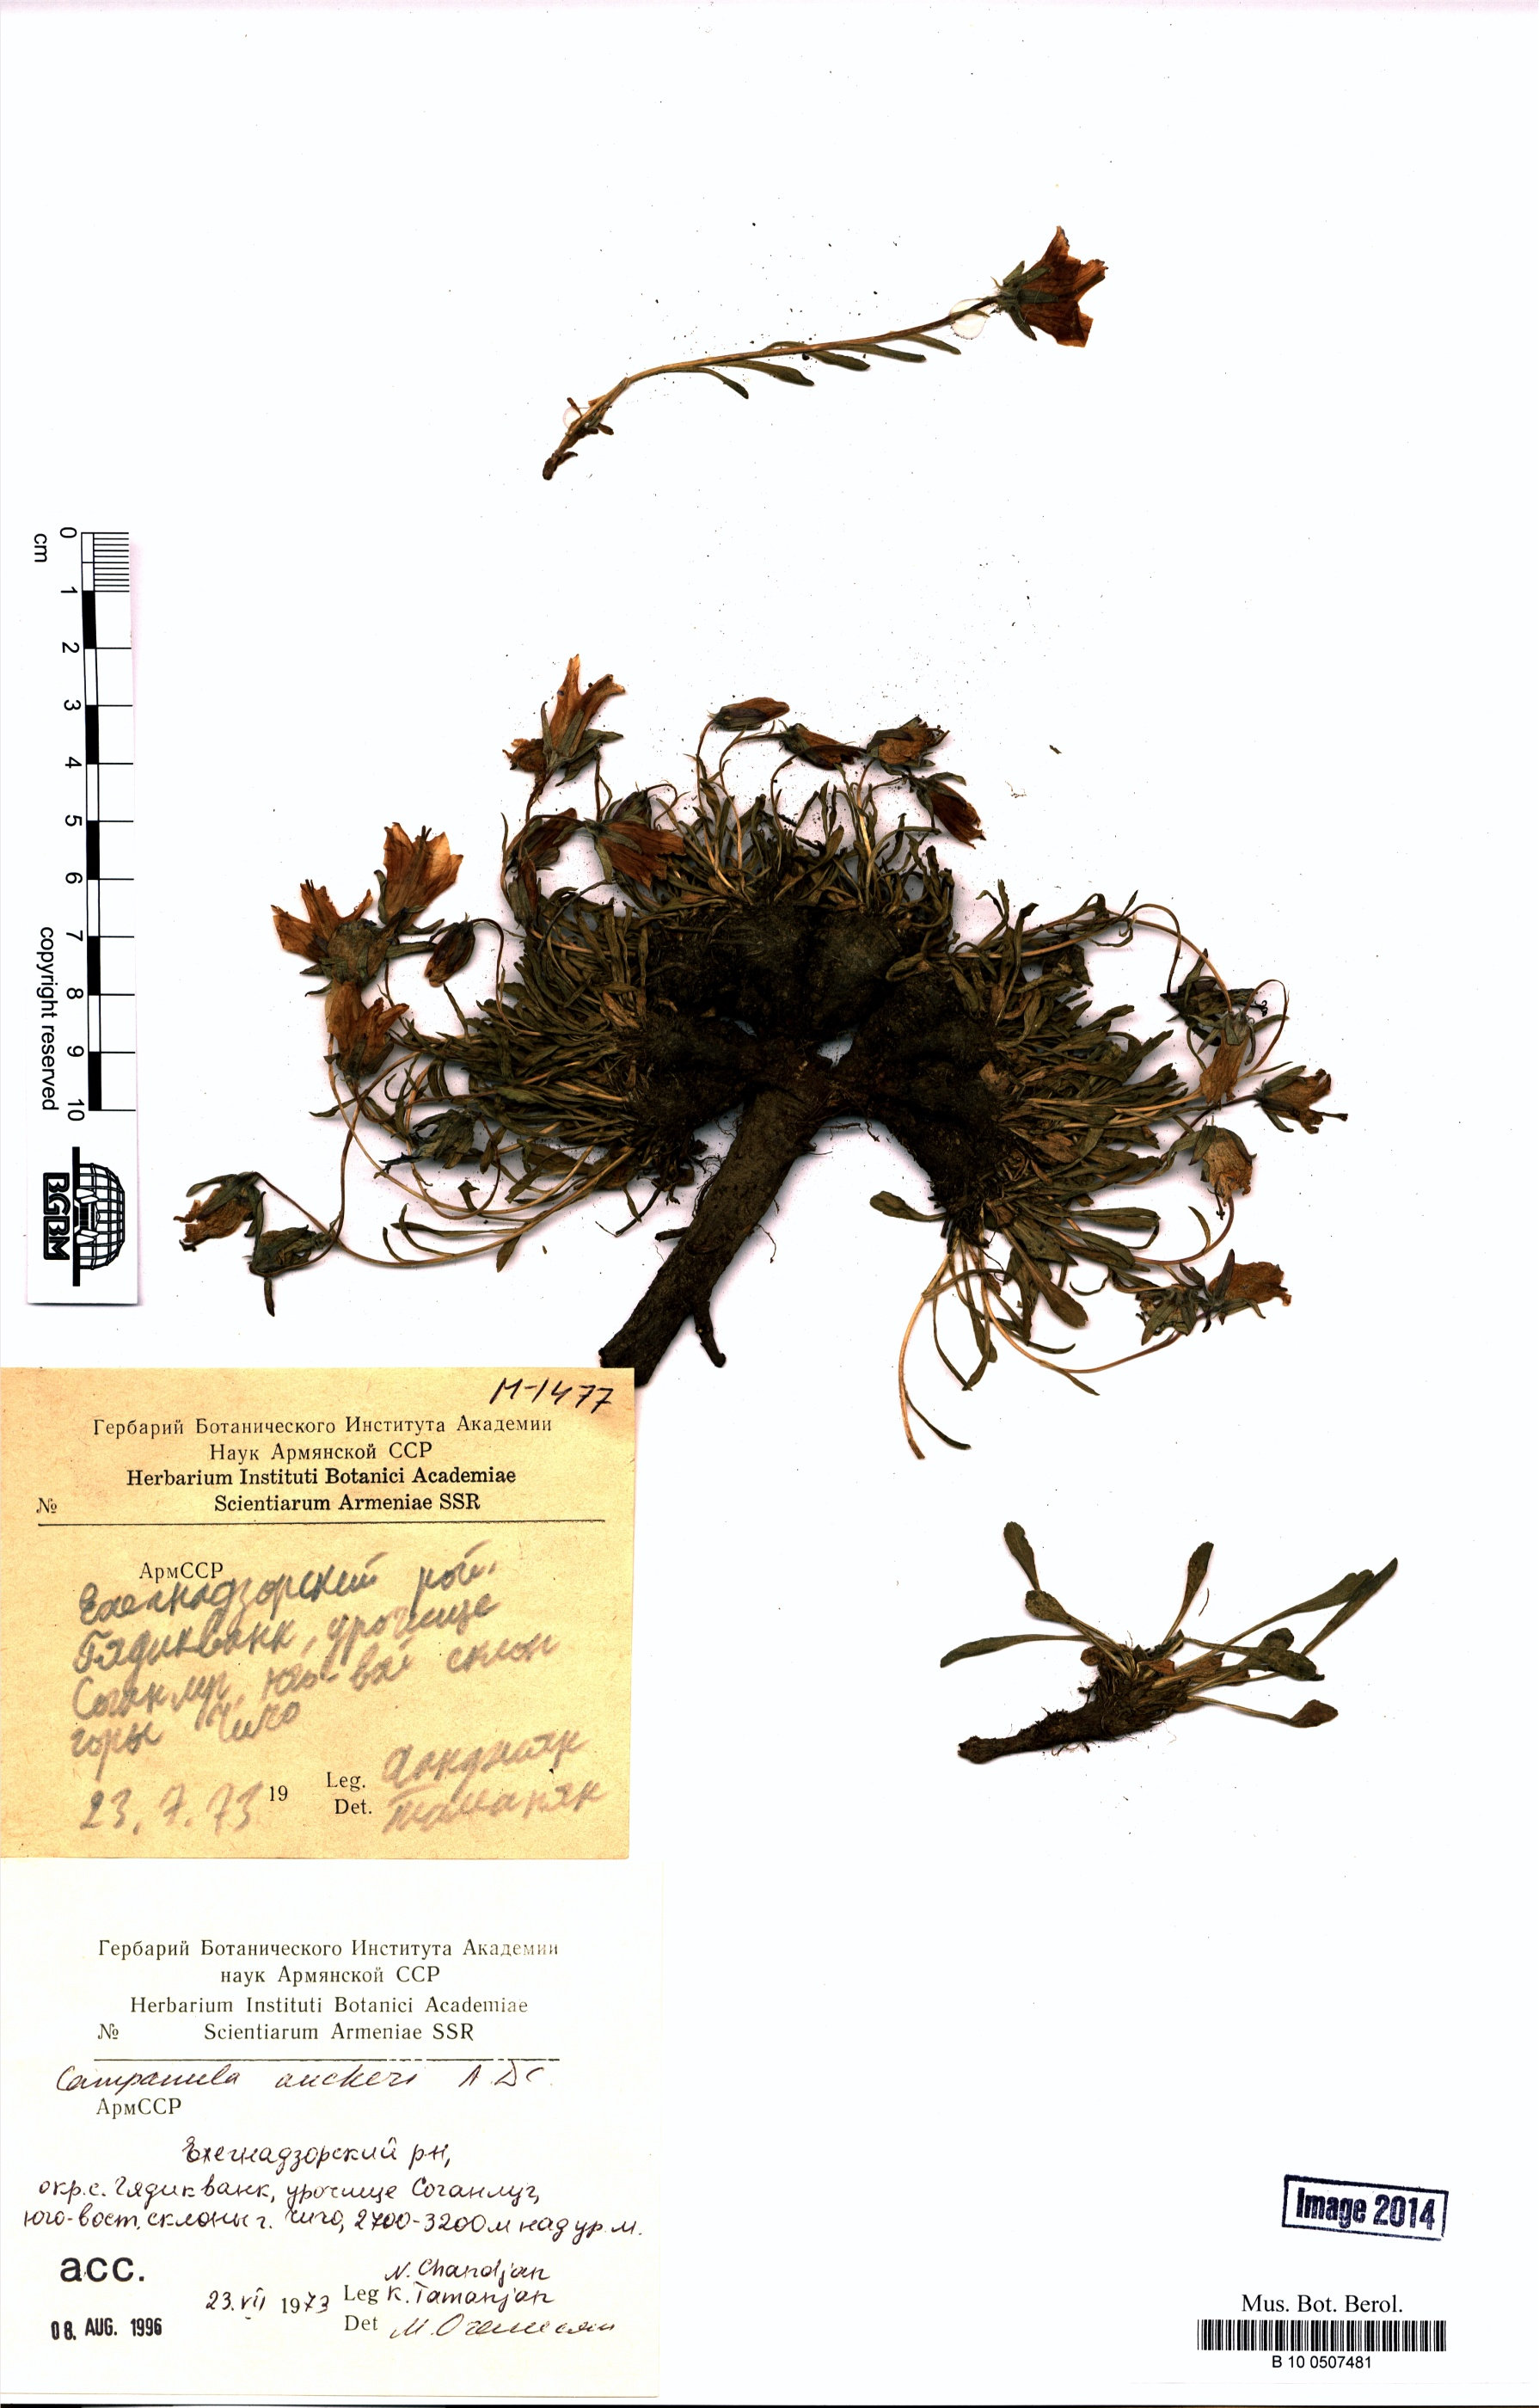 http://ww2.bgbm.org/herbarium/images/B/10/05/07/48/B_10_0507481.jpg